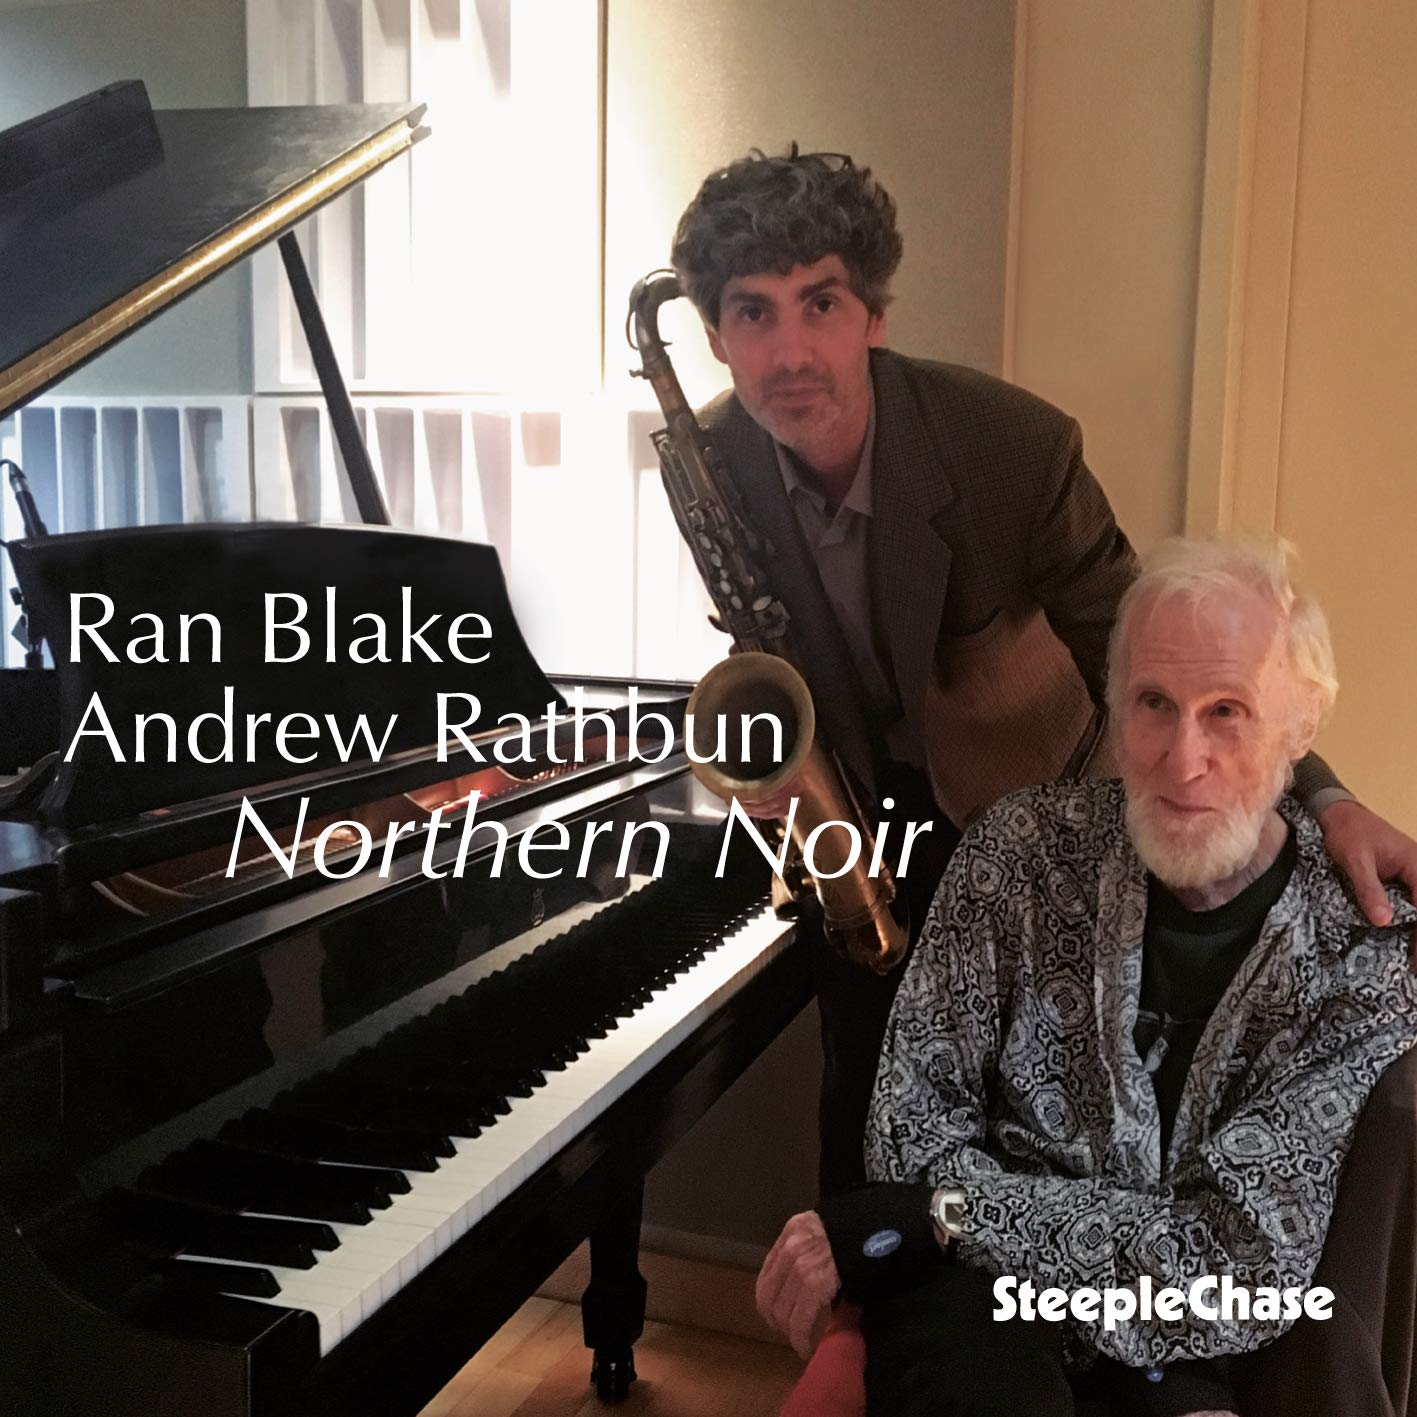 RAN BLAKE - Ran Blake, Andrew Rathbun : Northern Noir cover